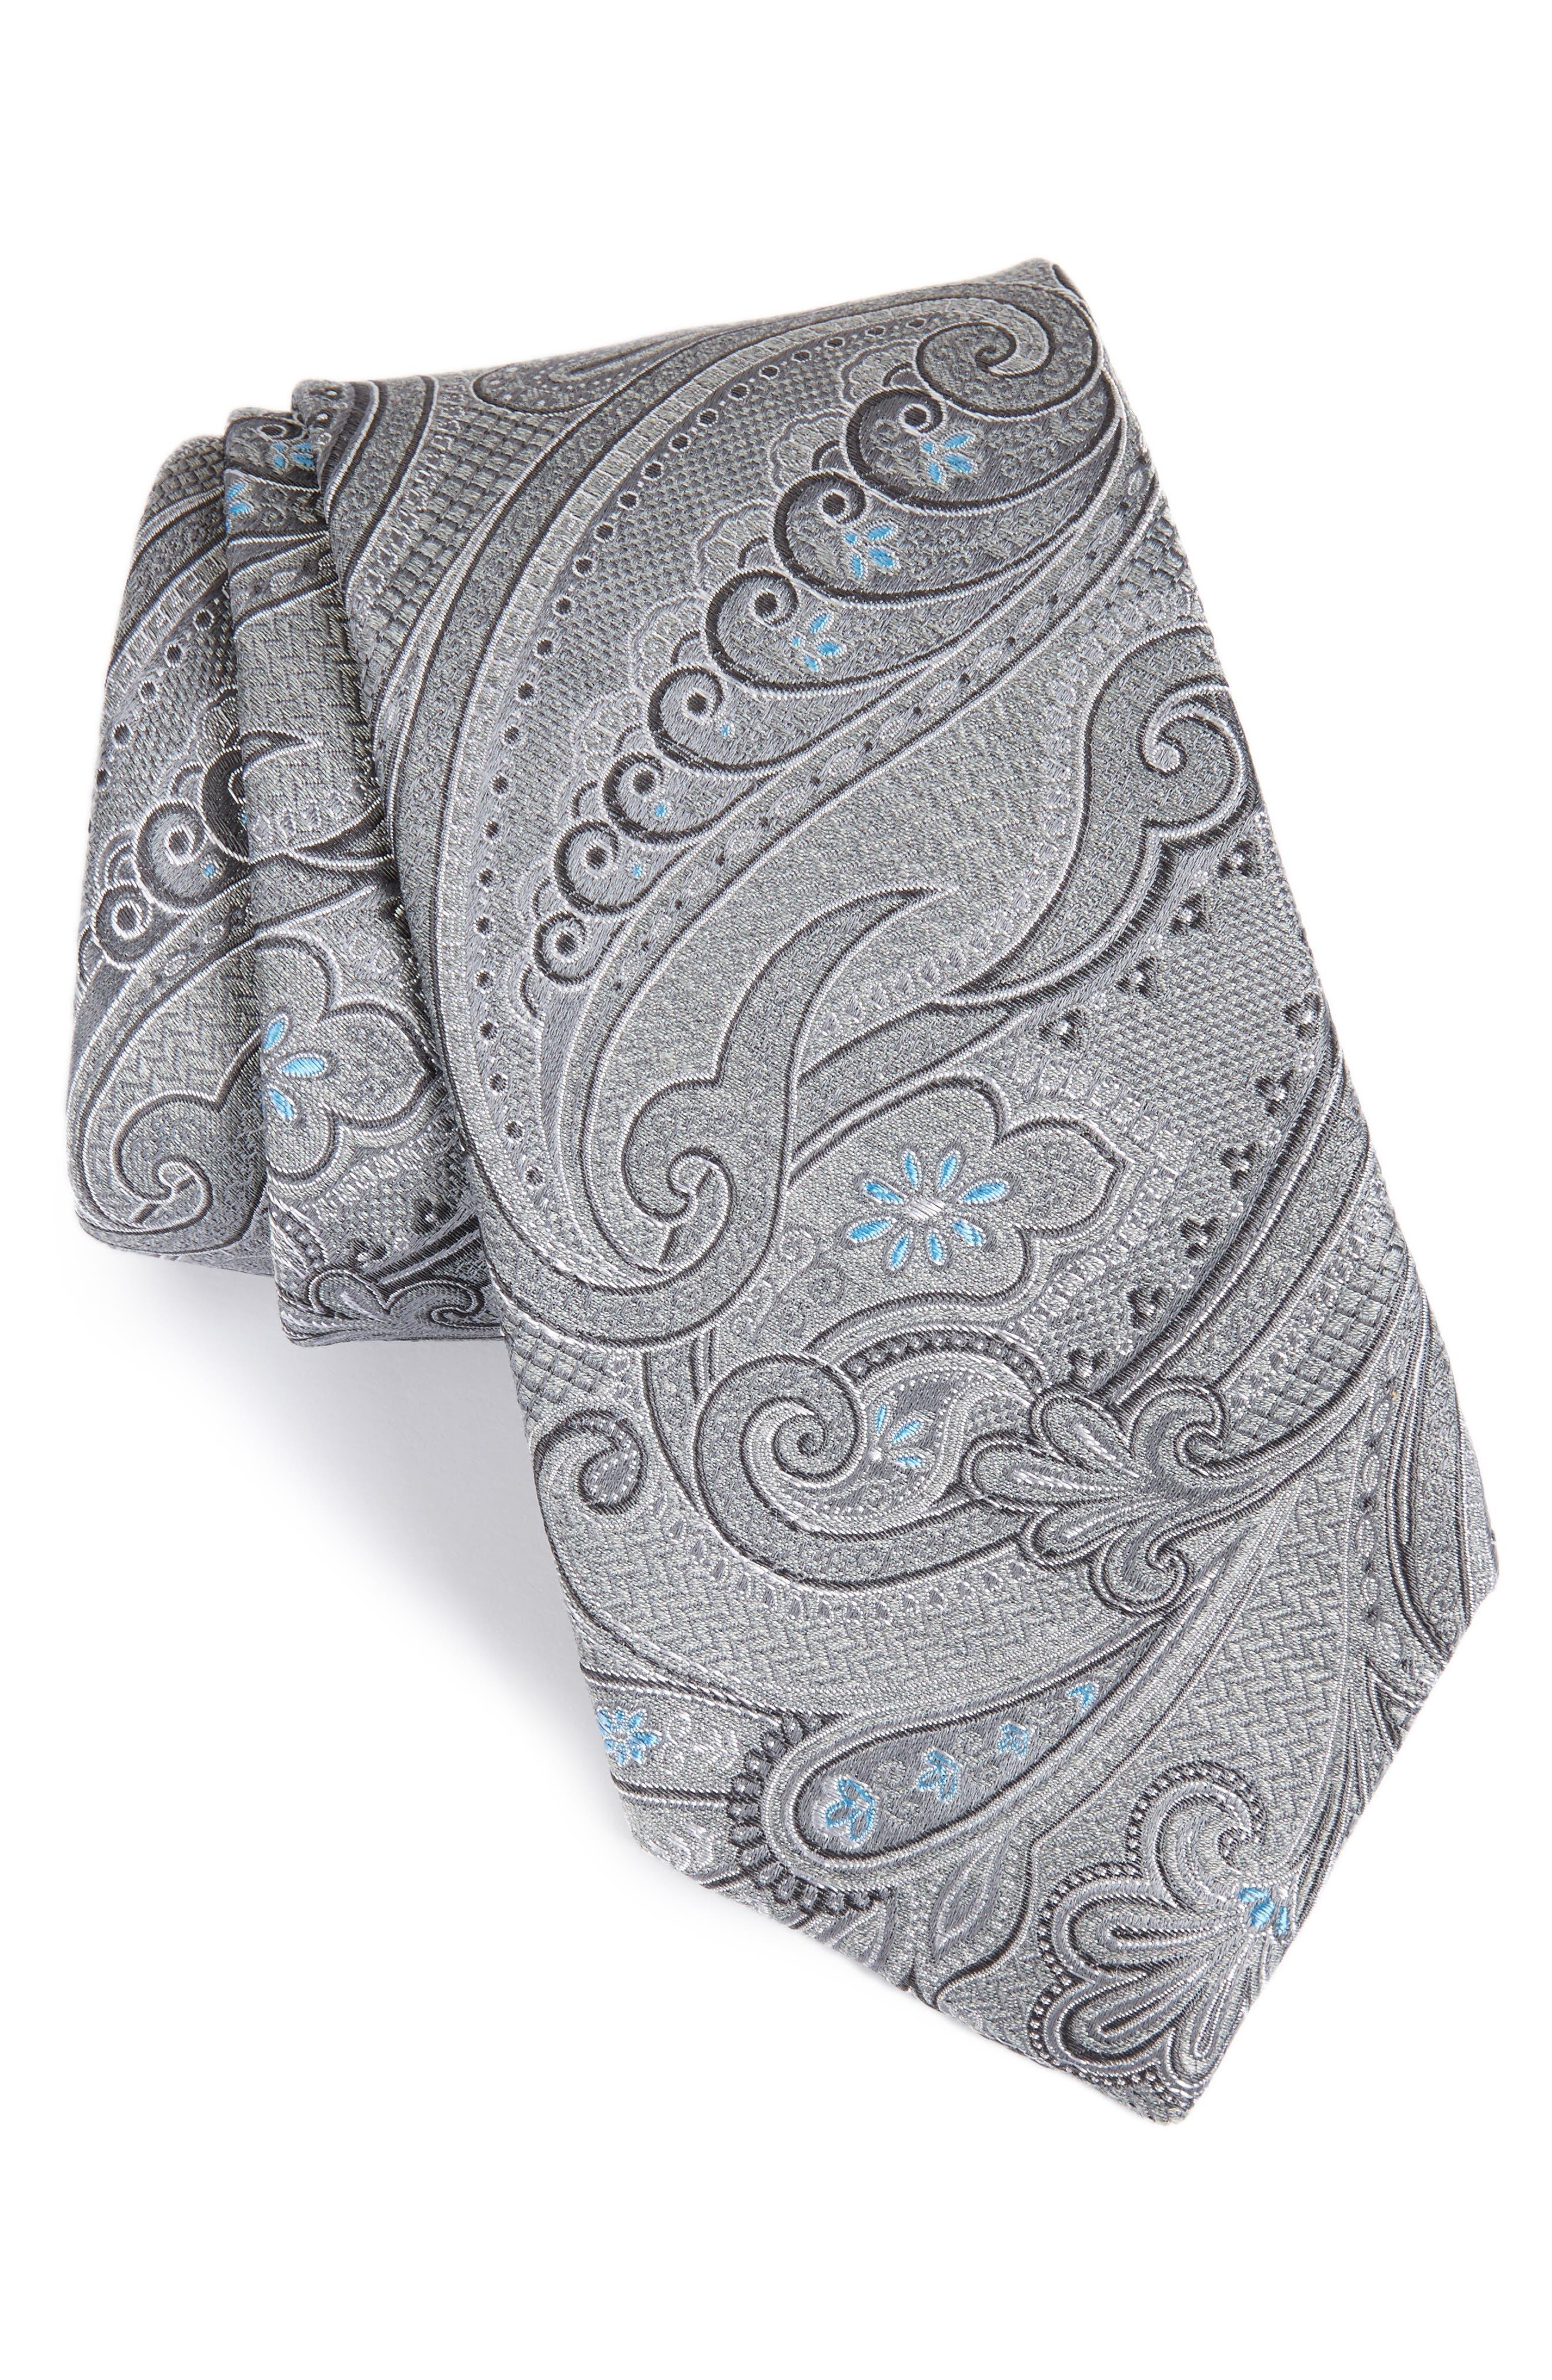 Bushnell Paisley Silk Blend Tie,                         Main,                         color, CHARCOAL